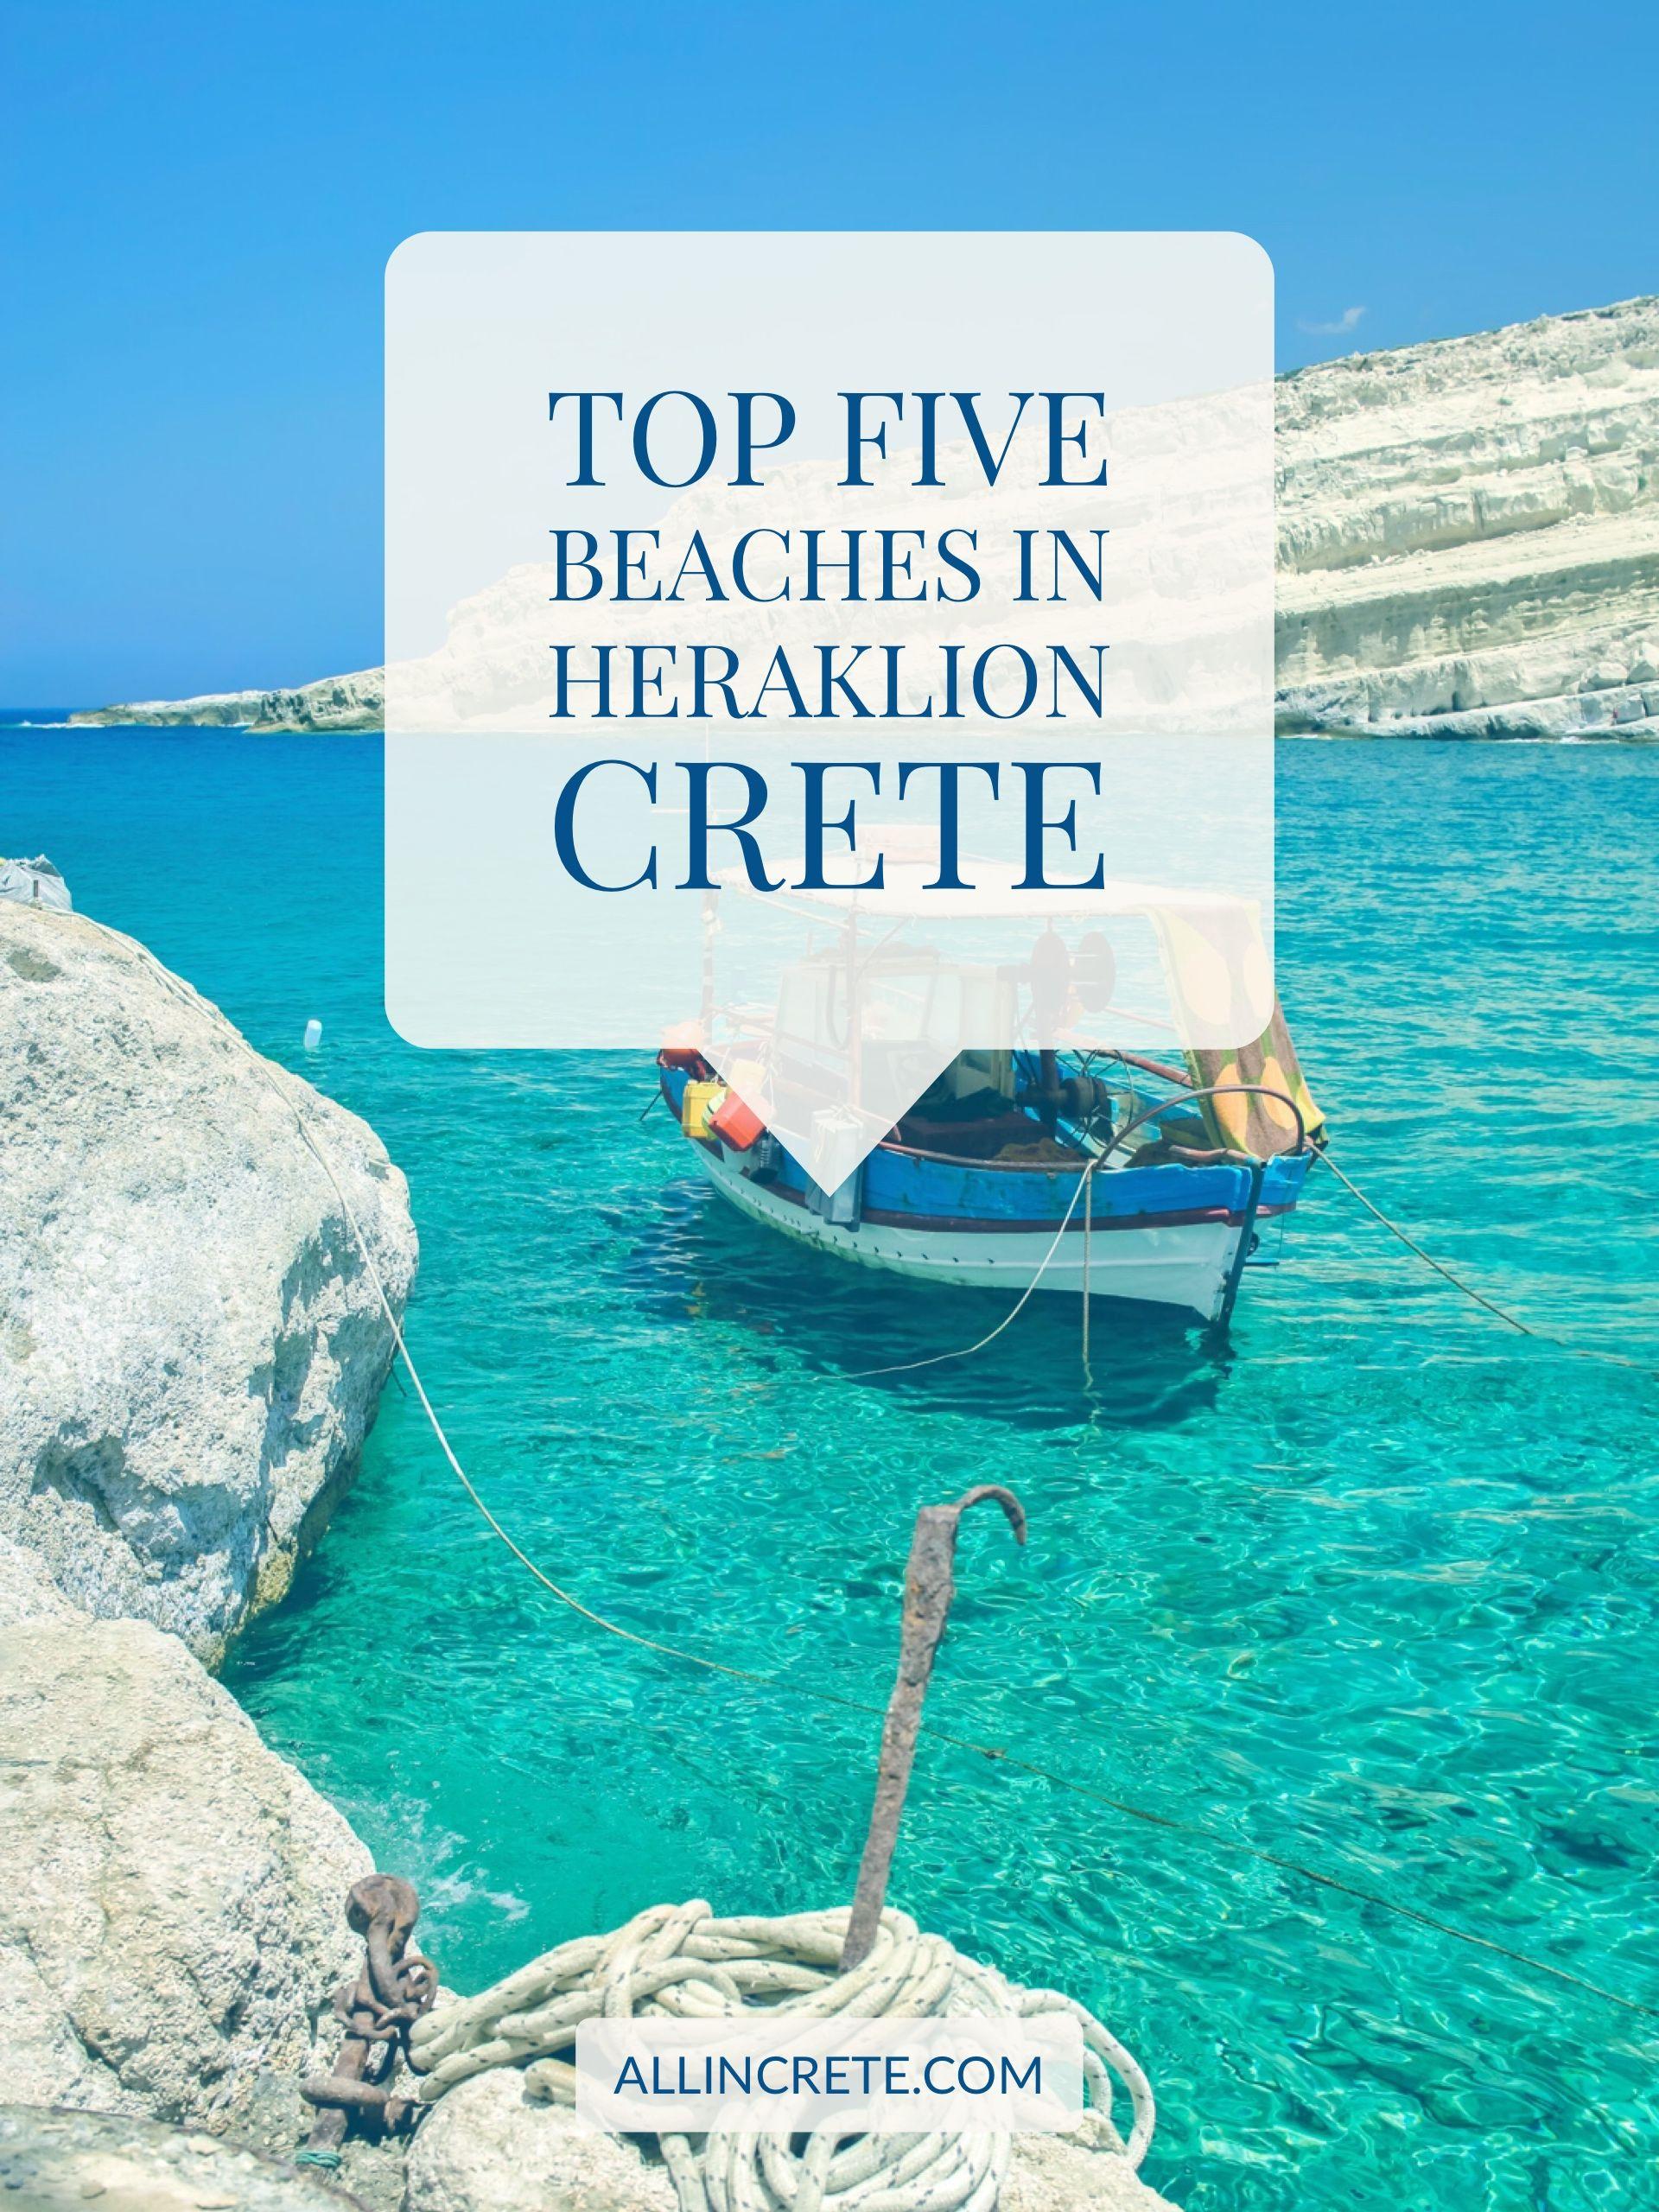 Top 5 Beaches In Heraklion 2020